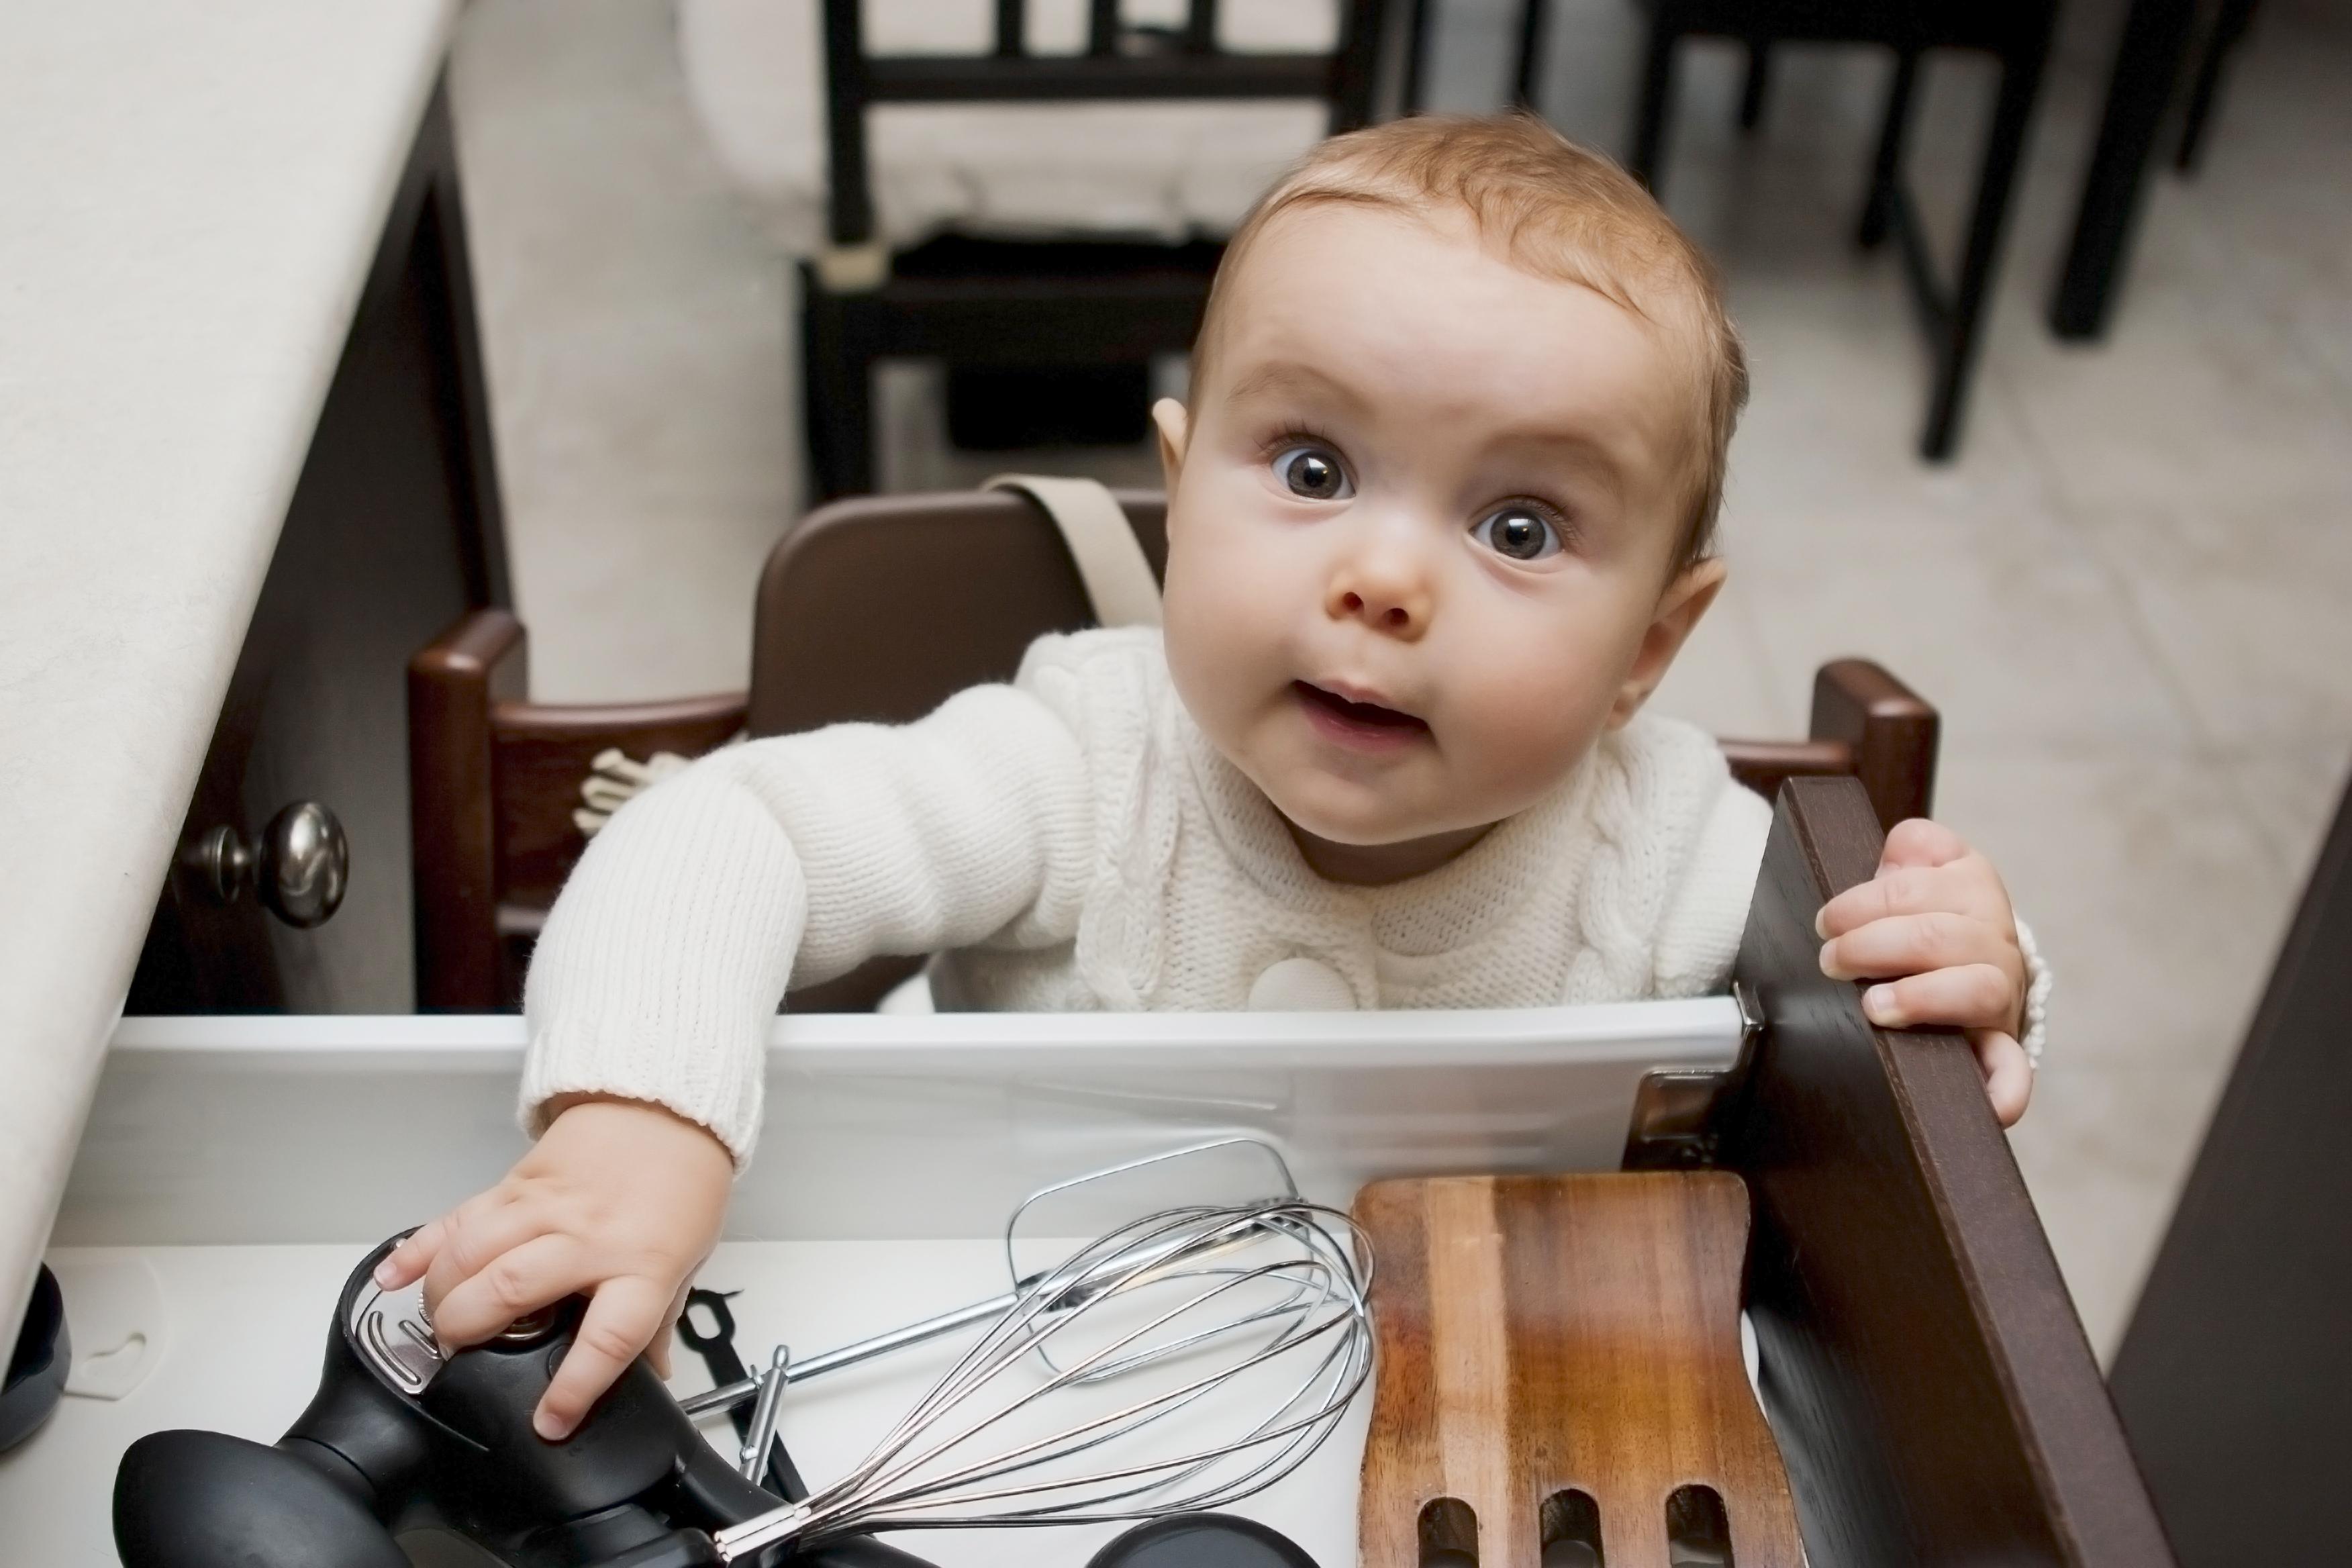 Baby reaching in kitchen drawer